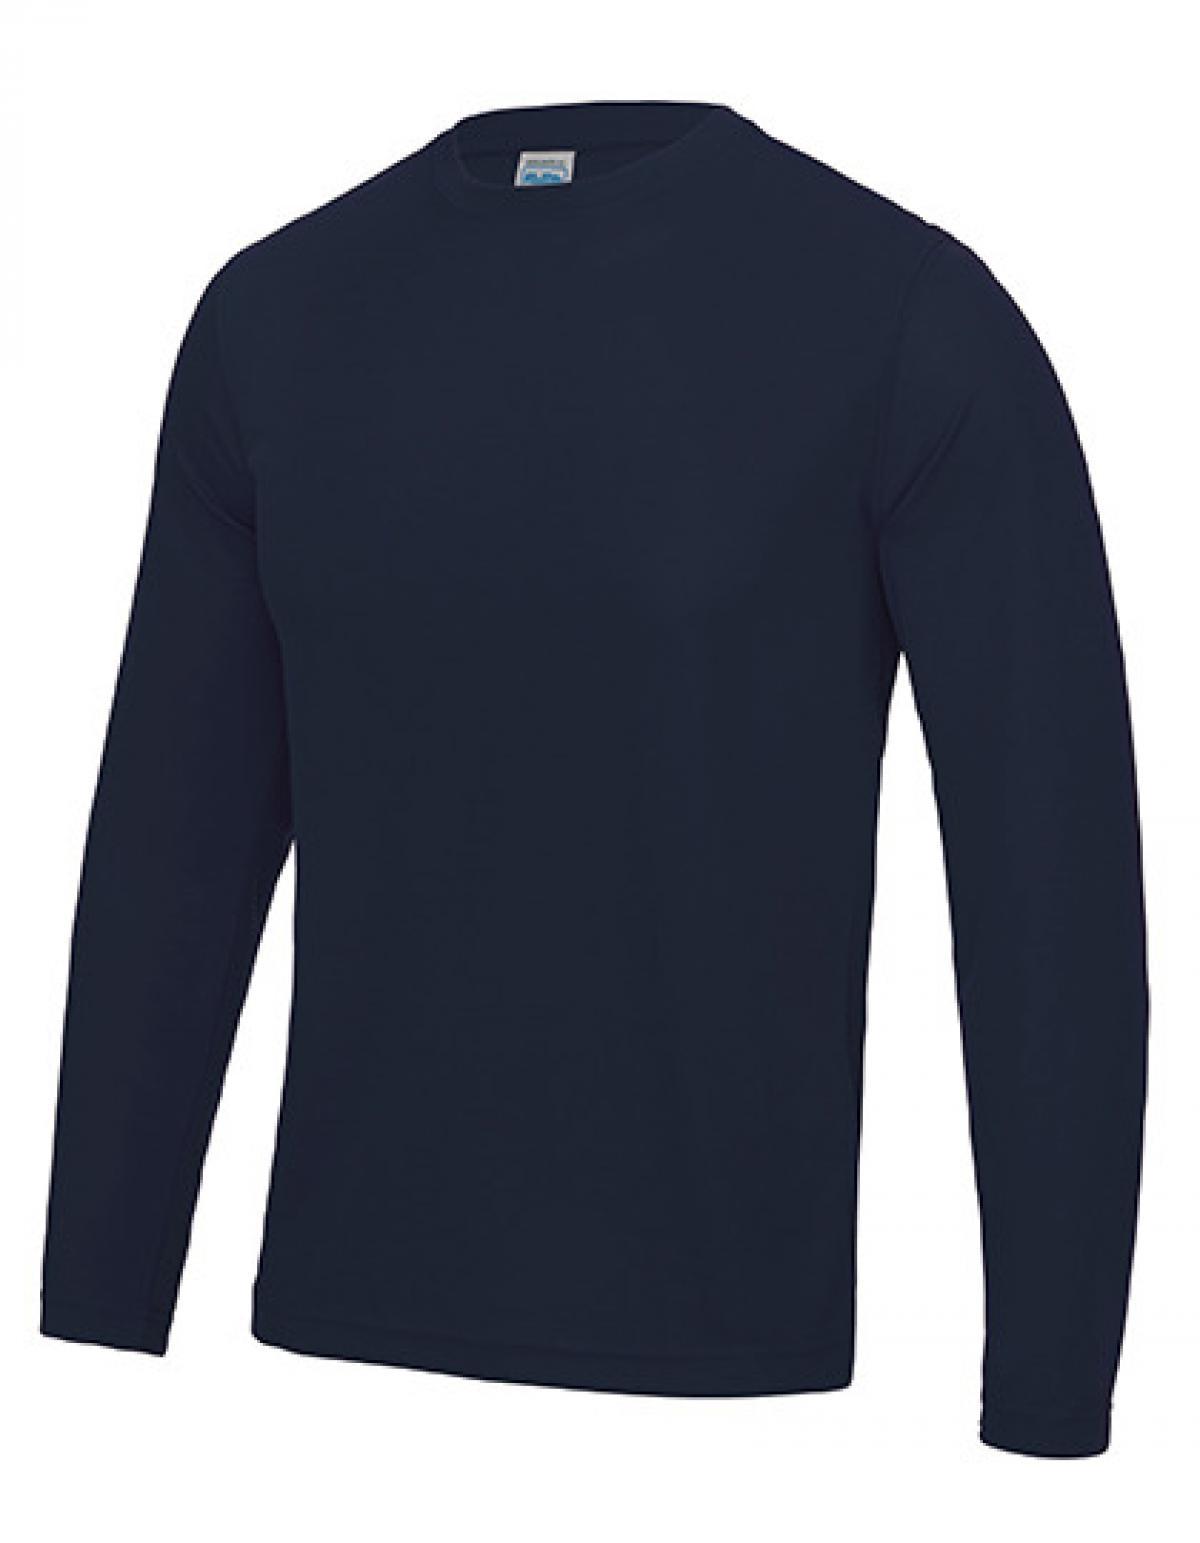 Long sleeve cool trainings longsleeve t shirt rexlander s for Cool long sleeve t shirts